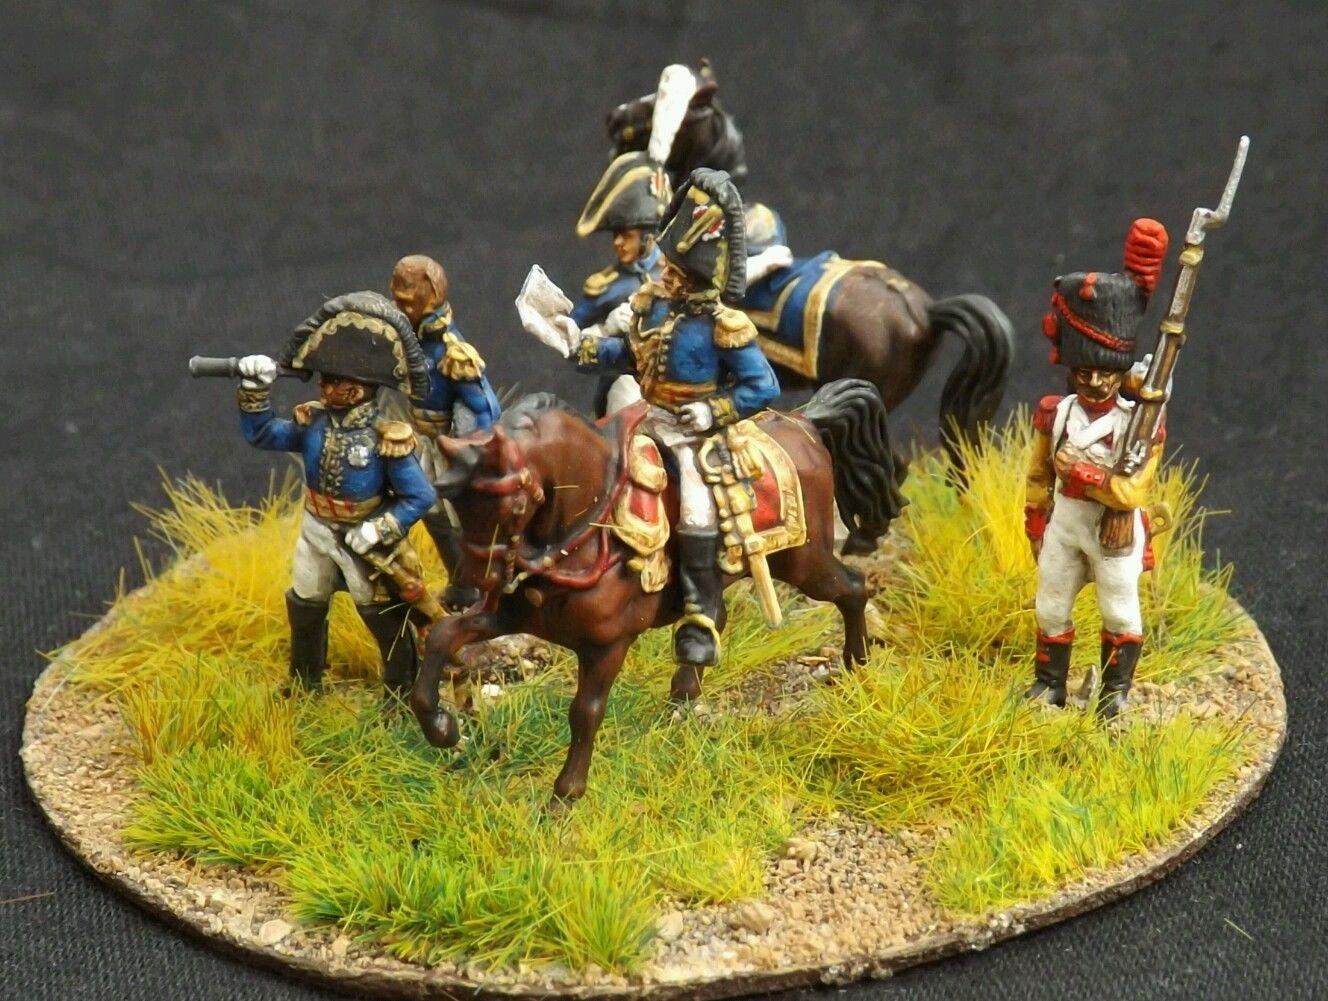 20mm 1 72 Zvesda Painted Napoleonic French General Staff Wargame Waterloo 1812 | eBay